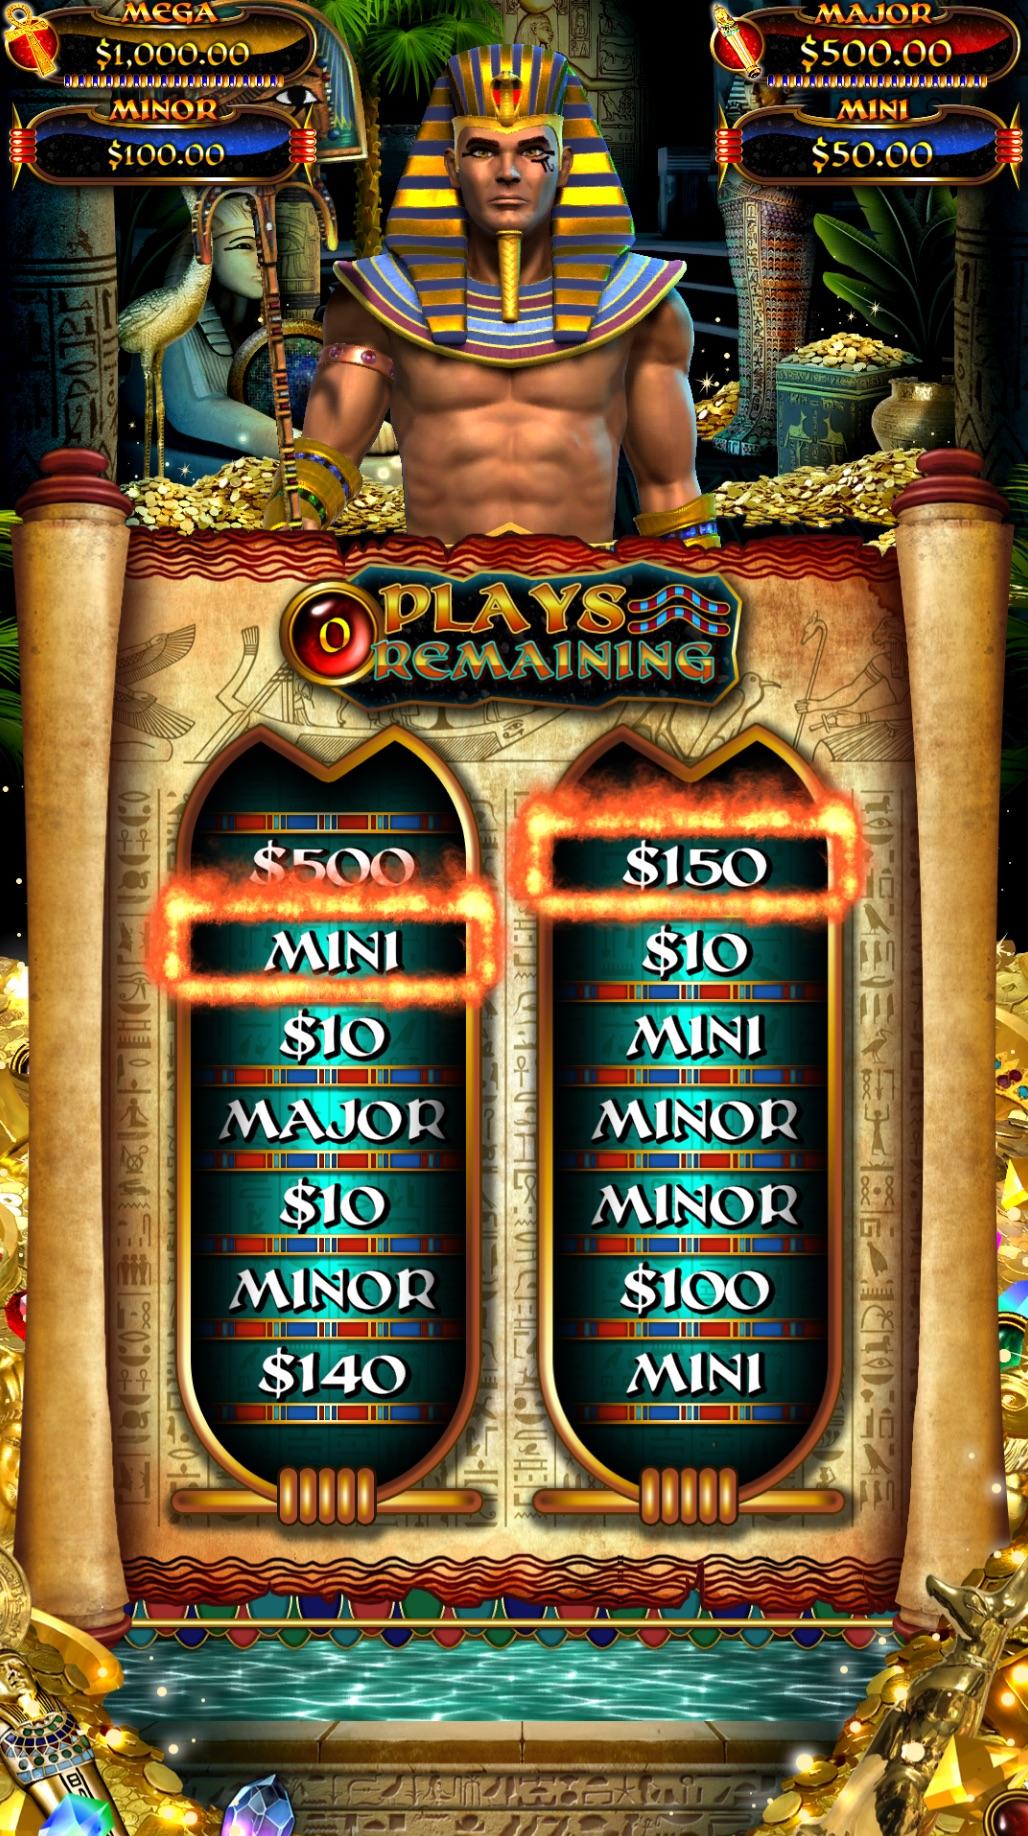 Golden-Pharaoh-pull-tab-game-screen-shot-bonus